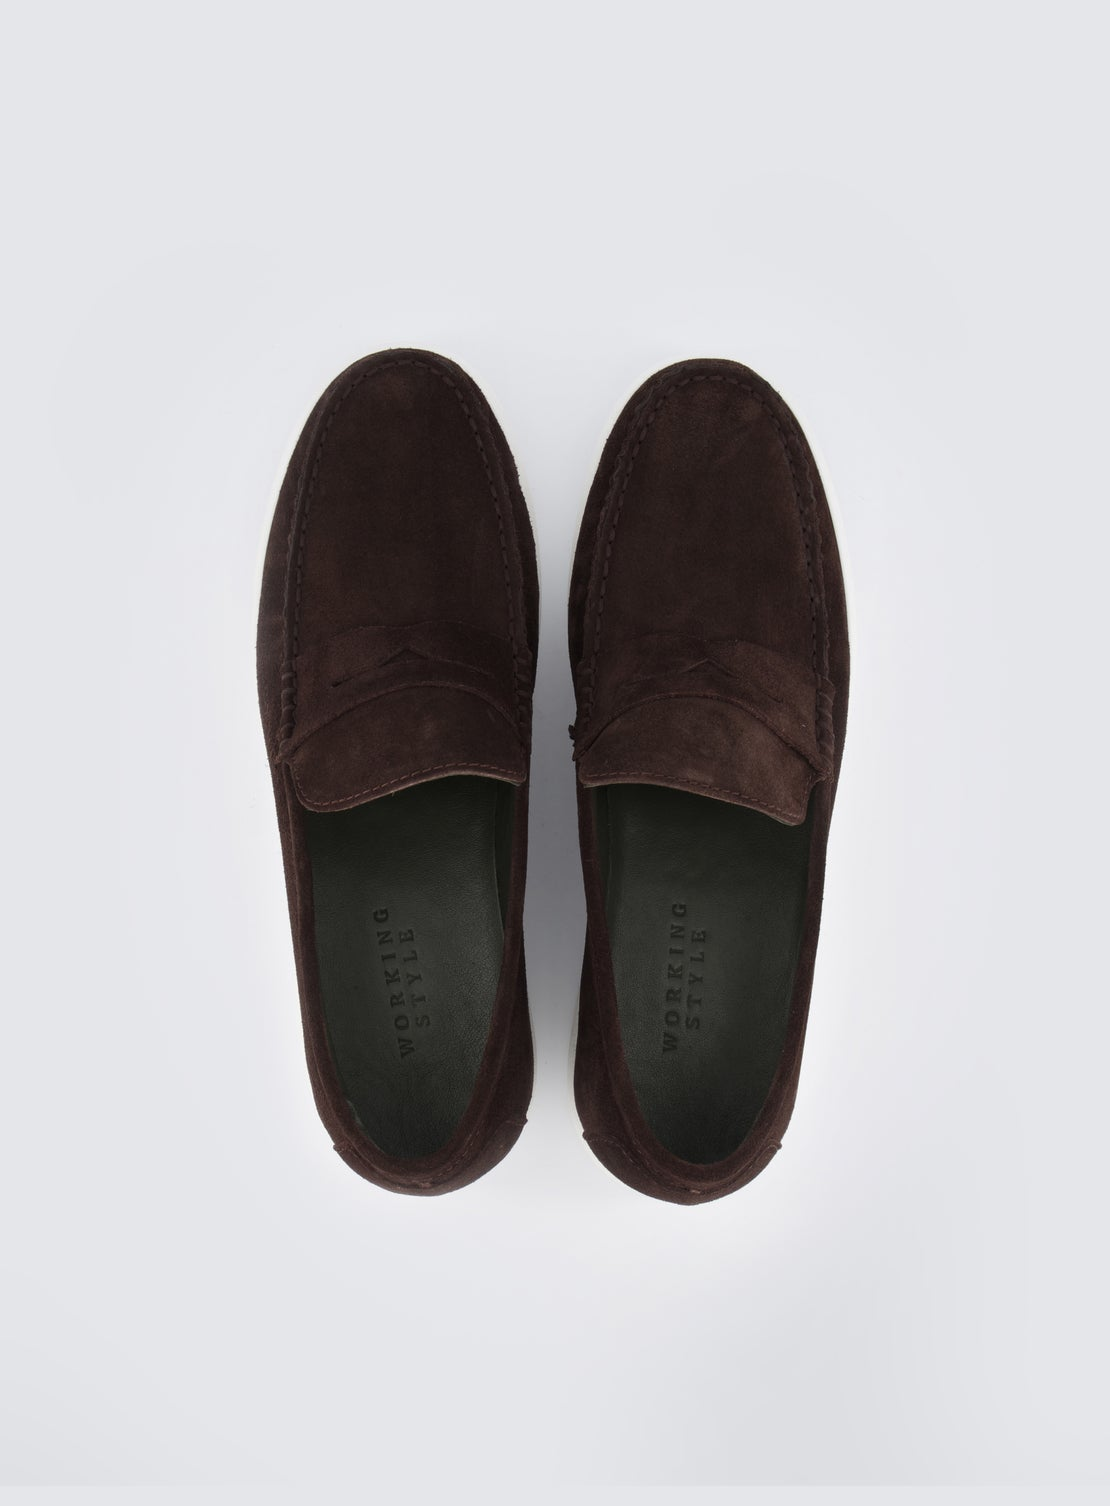 Bauhaus Chocolate Casual Loafer